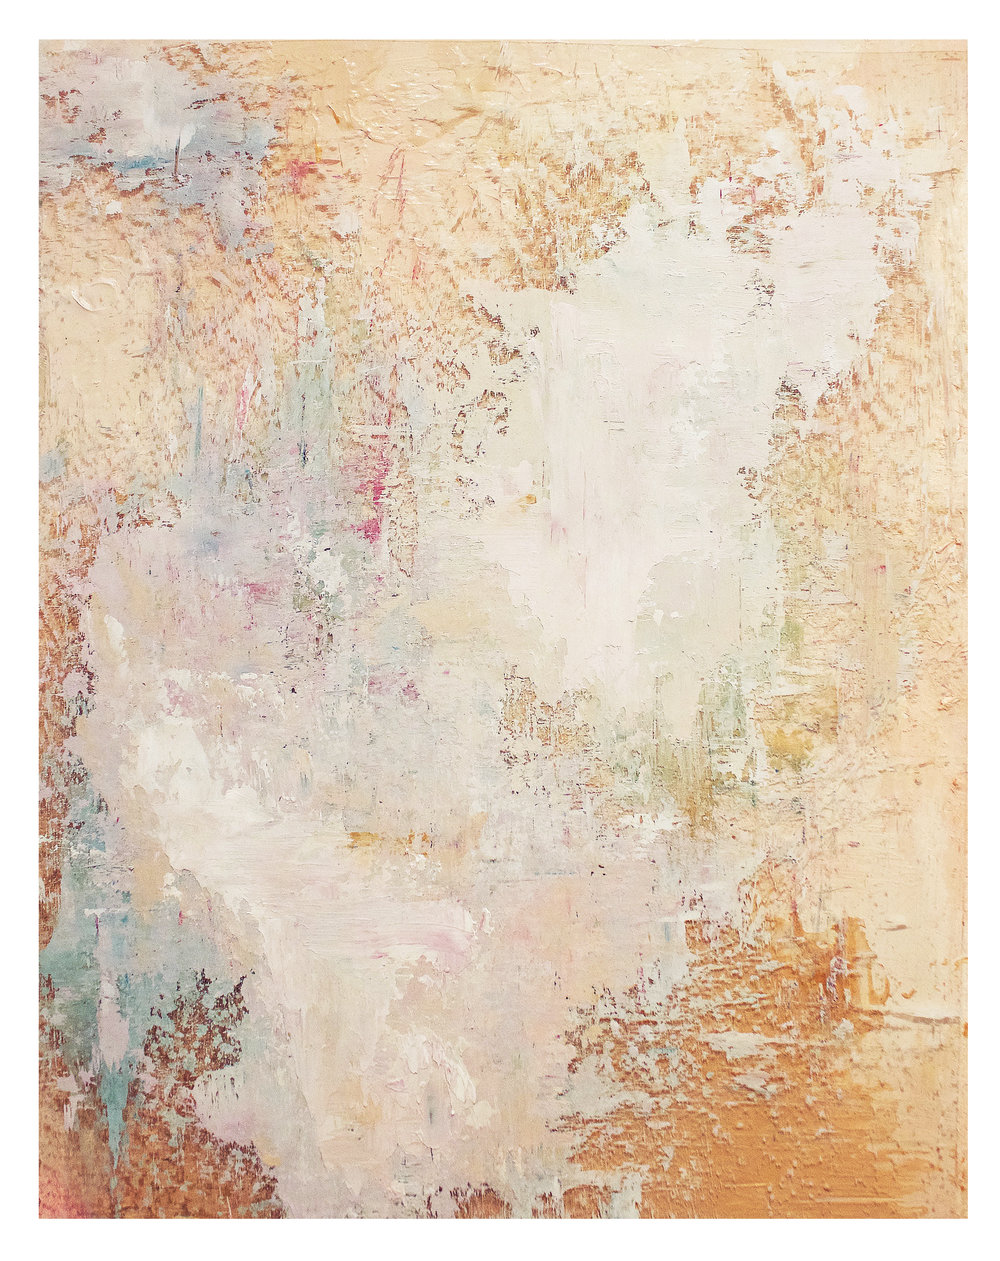 - Haze III2015Acrylic on dura-lar on paper14 x 11 inches